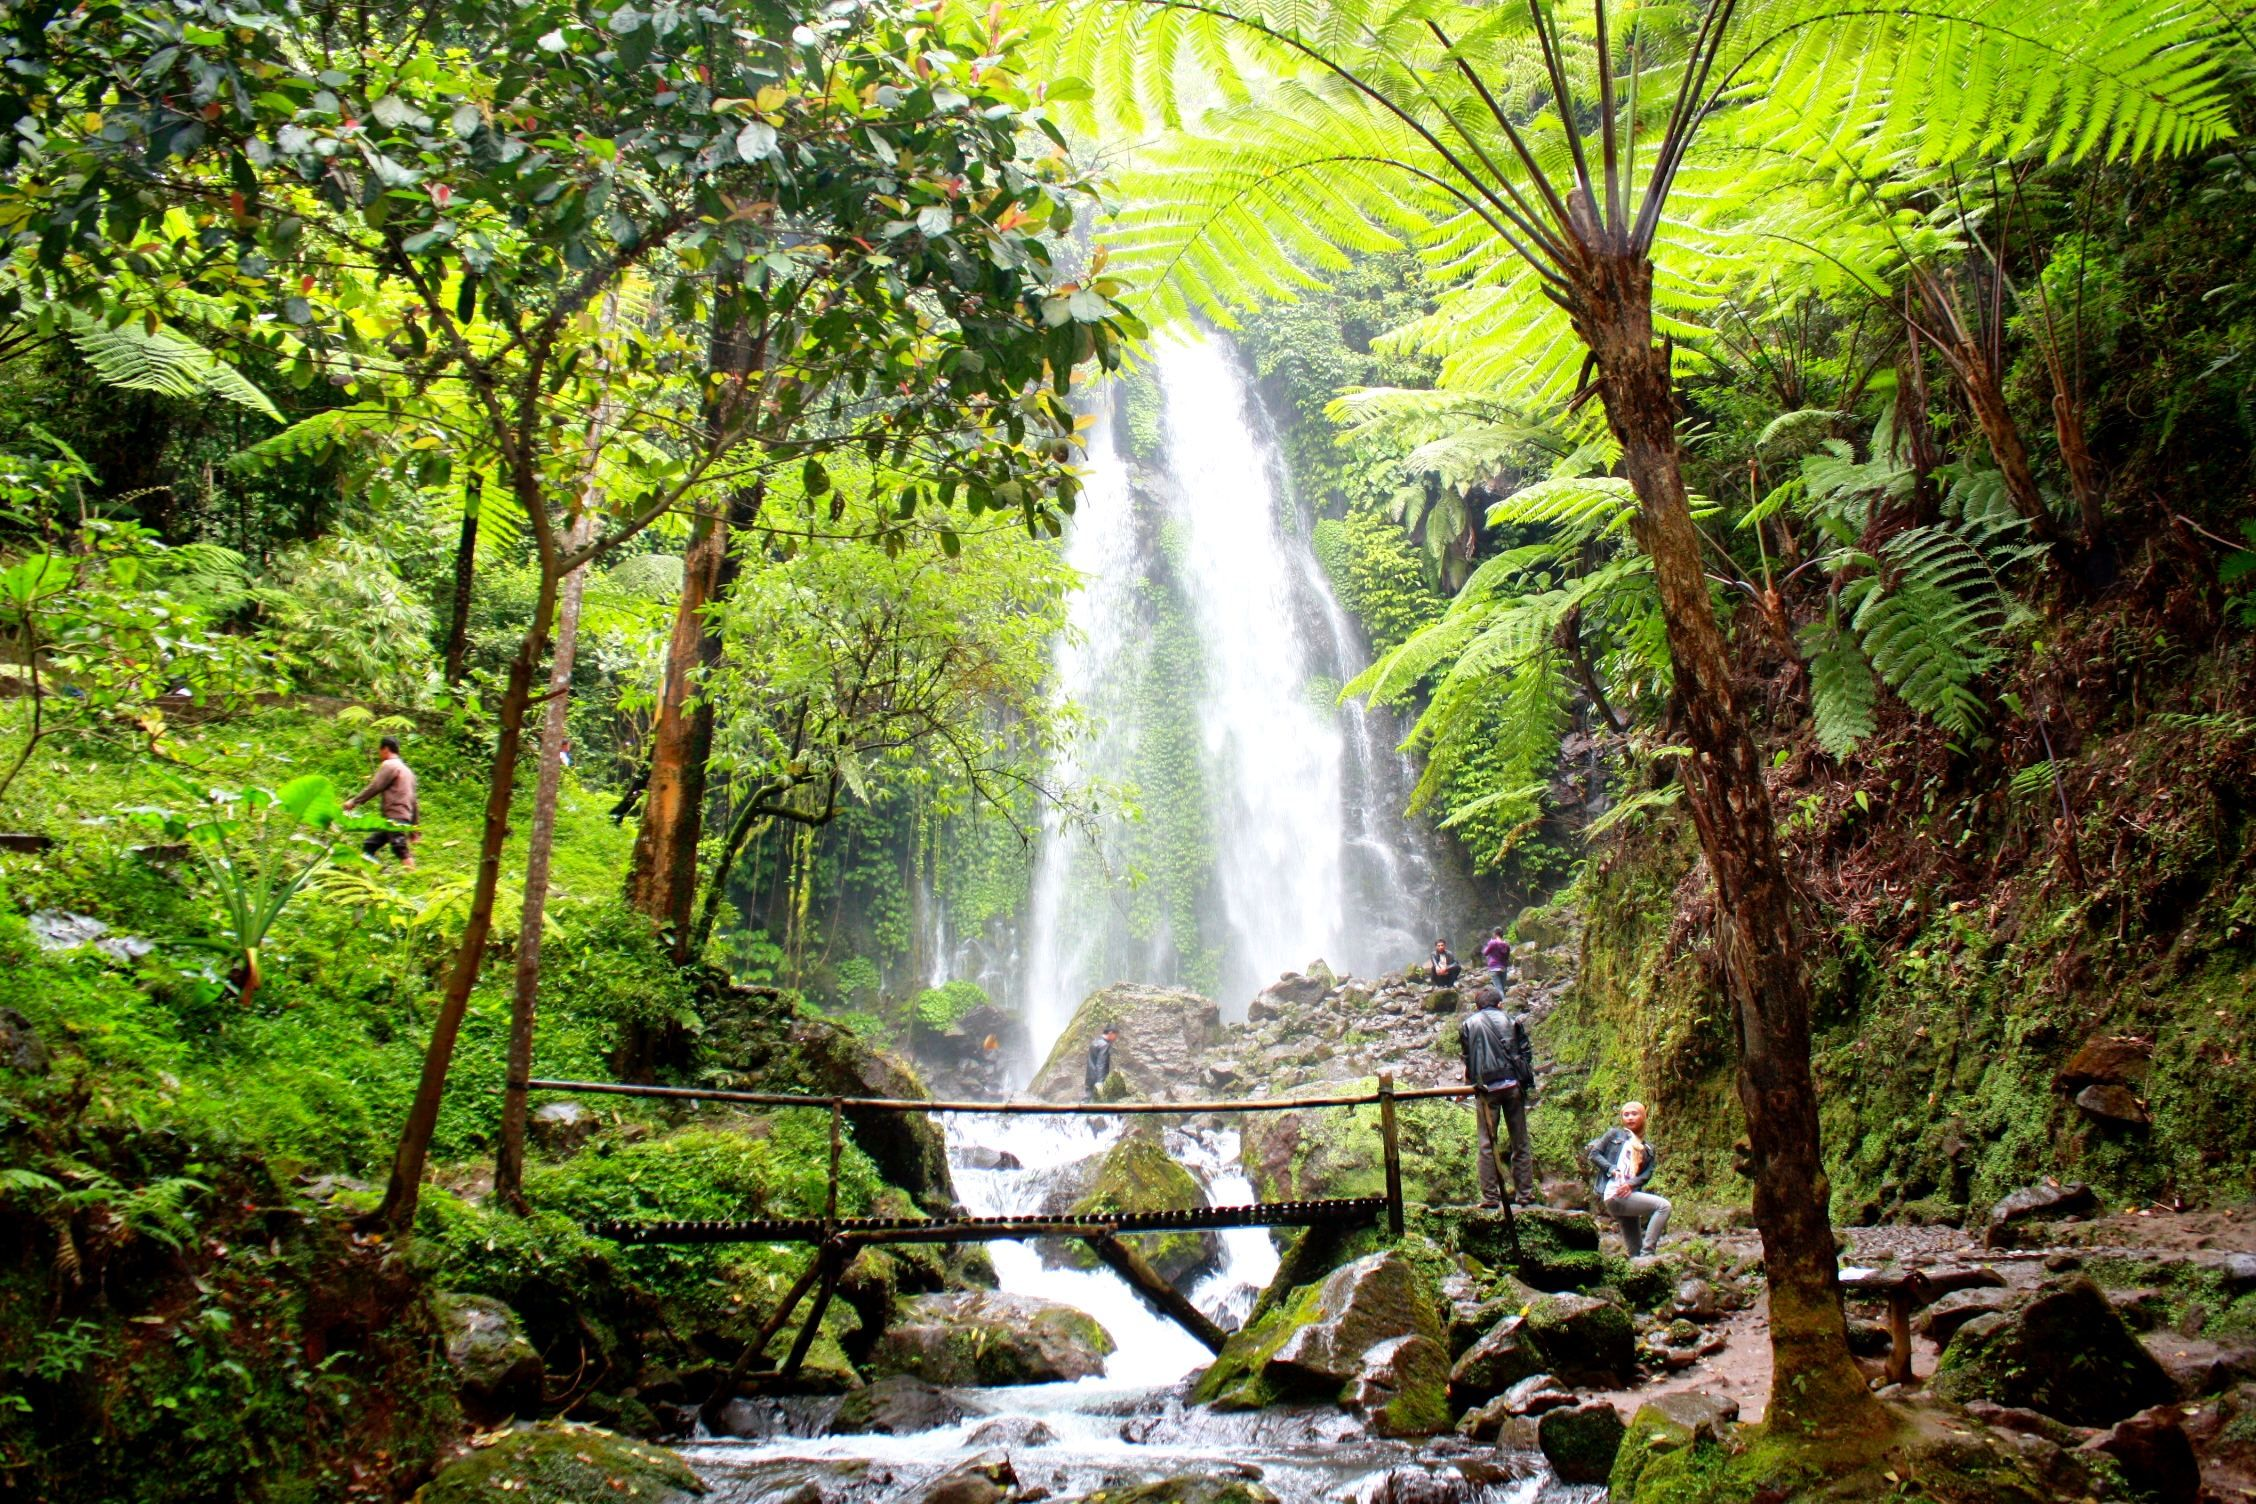 Tawangmangu Wisata Alam Terkeren Di Solo Wisatasenibudaya